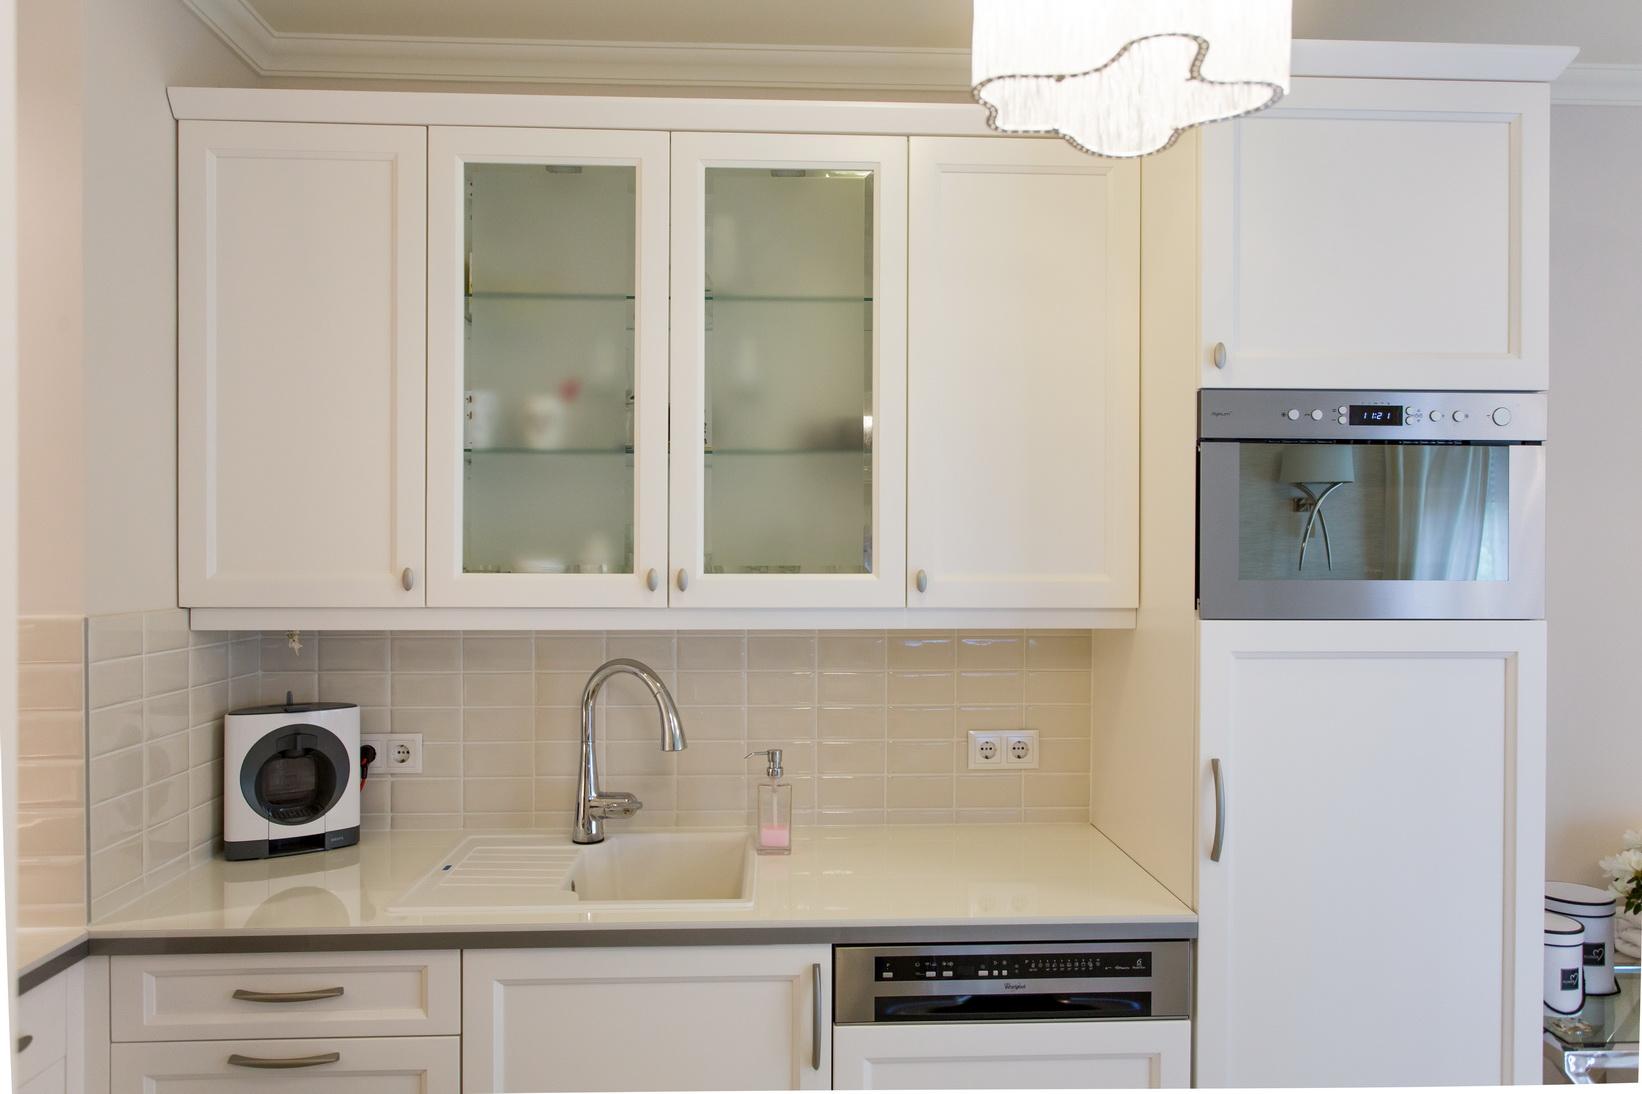 Selyemfényű festett konyhabútor vintage stílusban